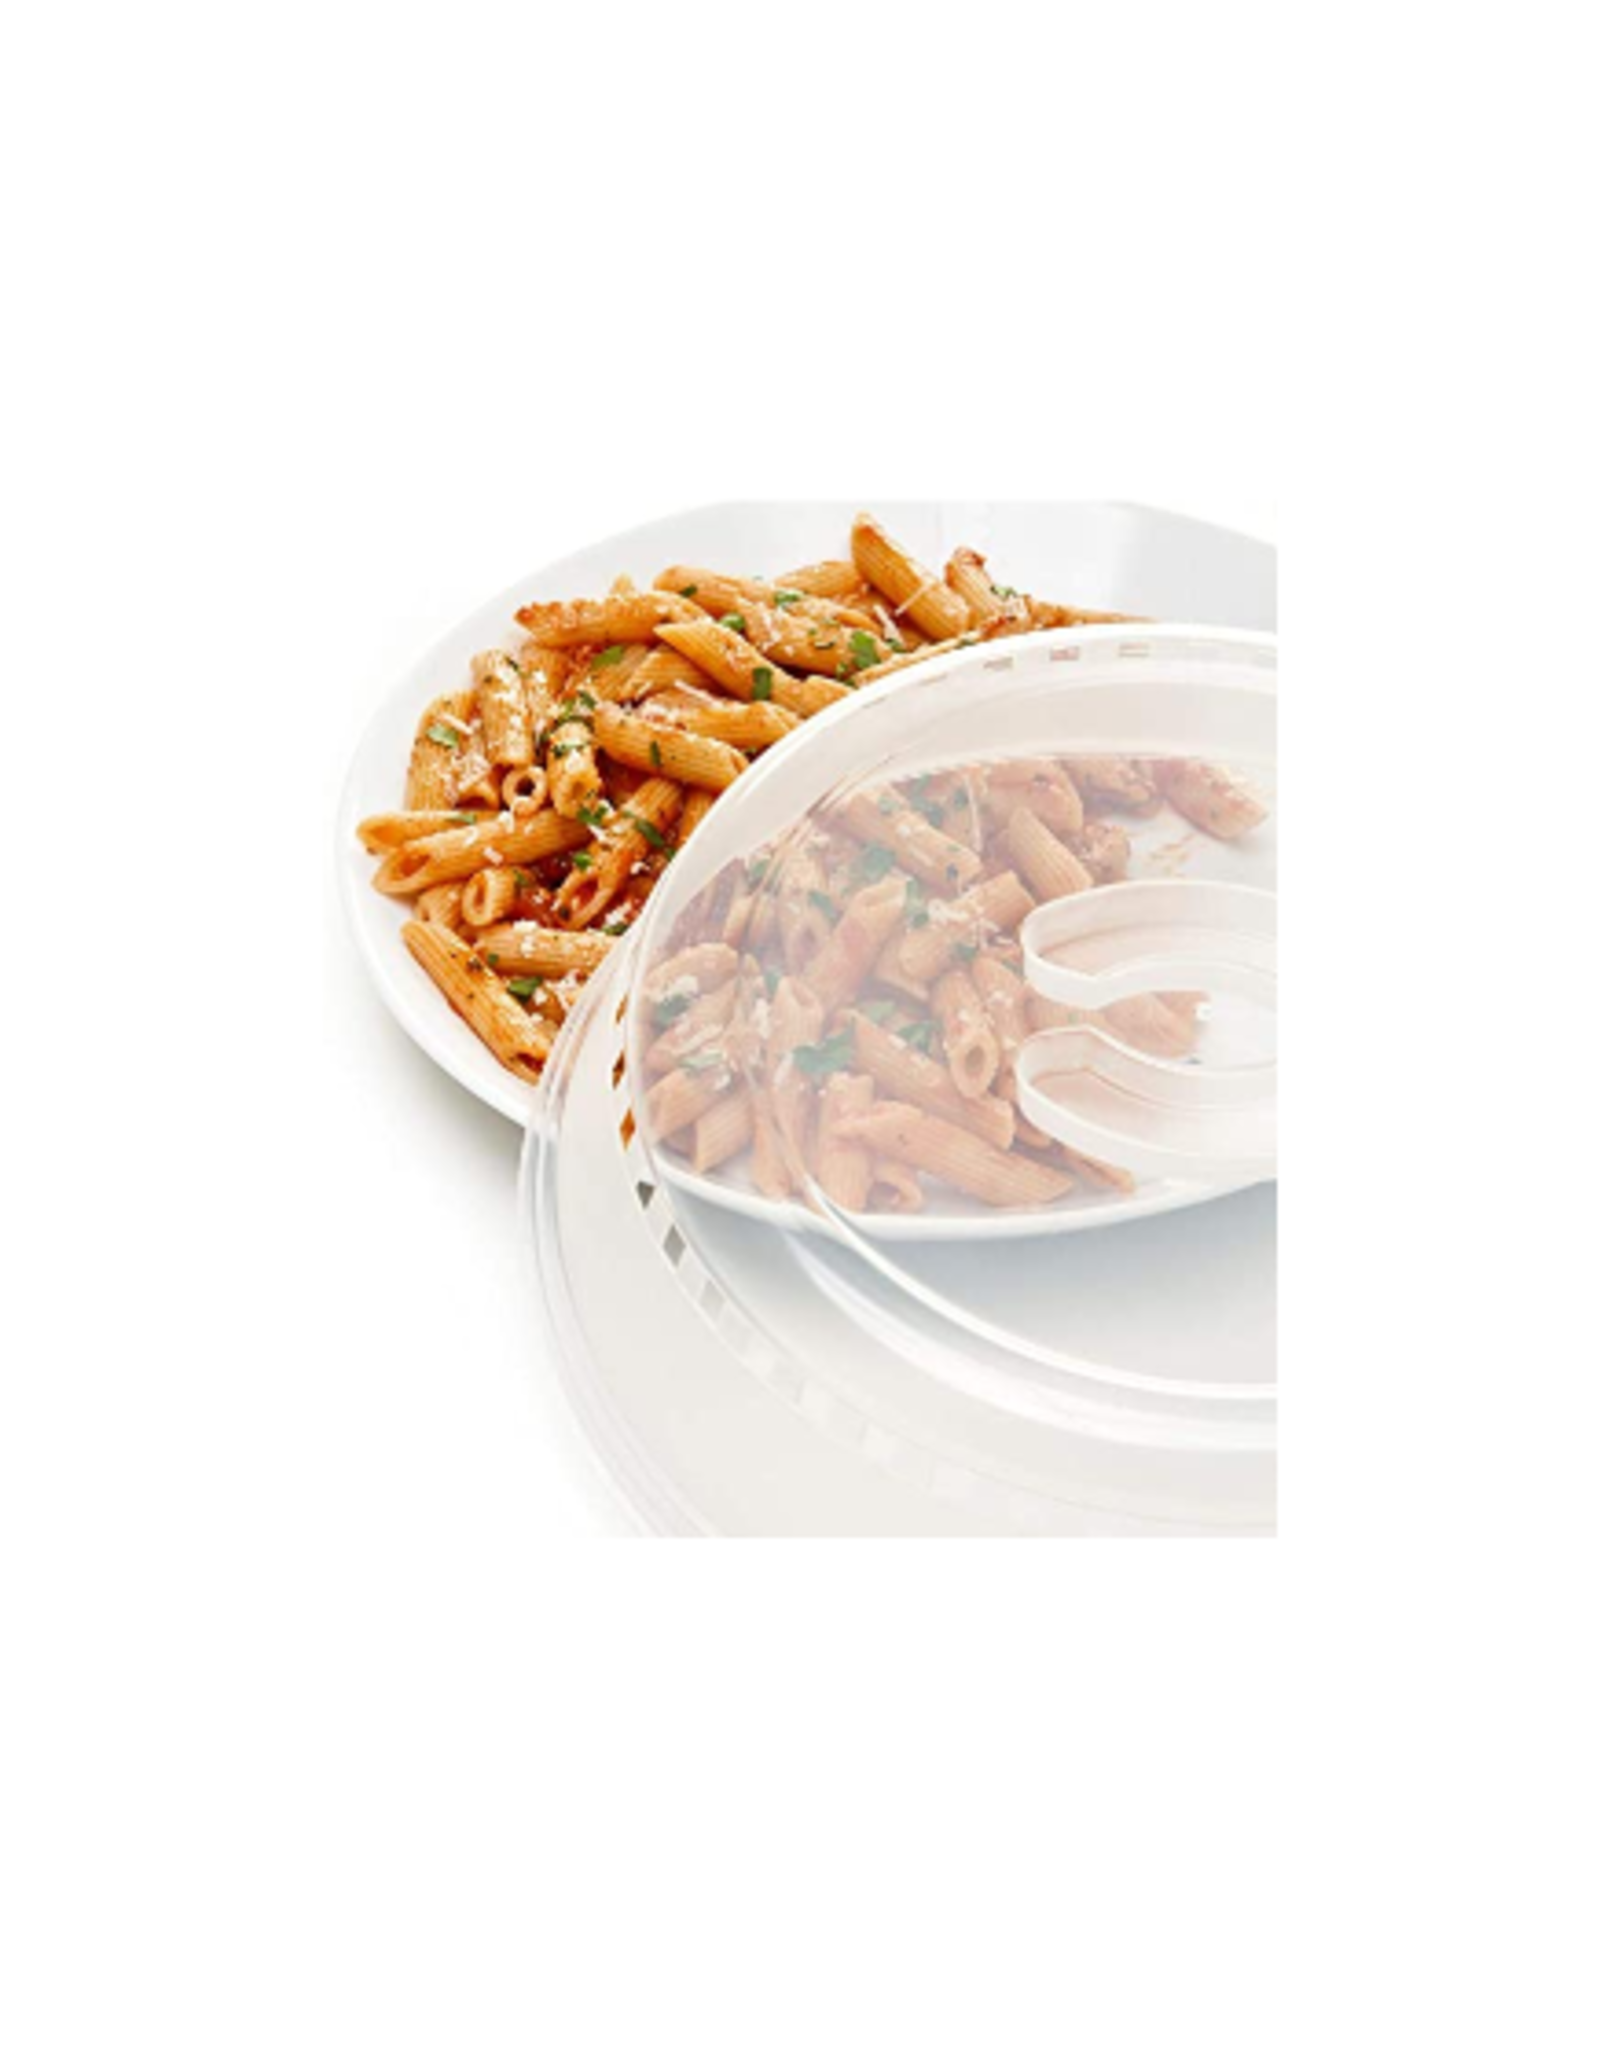 Progressive Microwave Food Cover